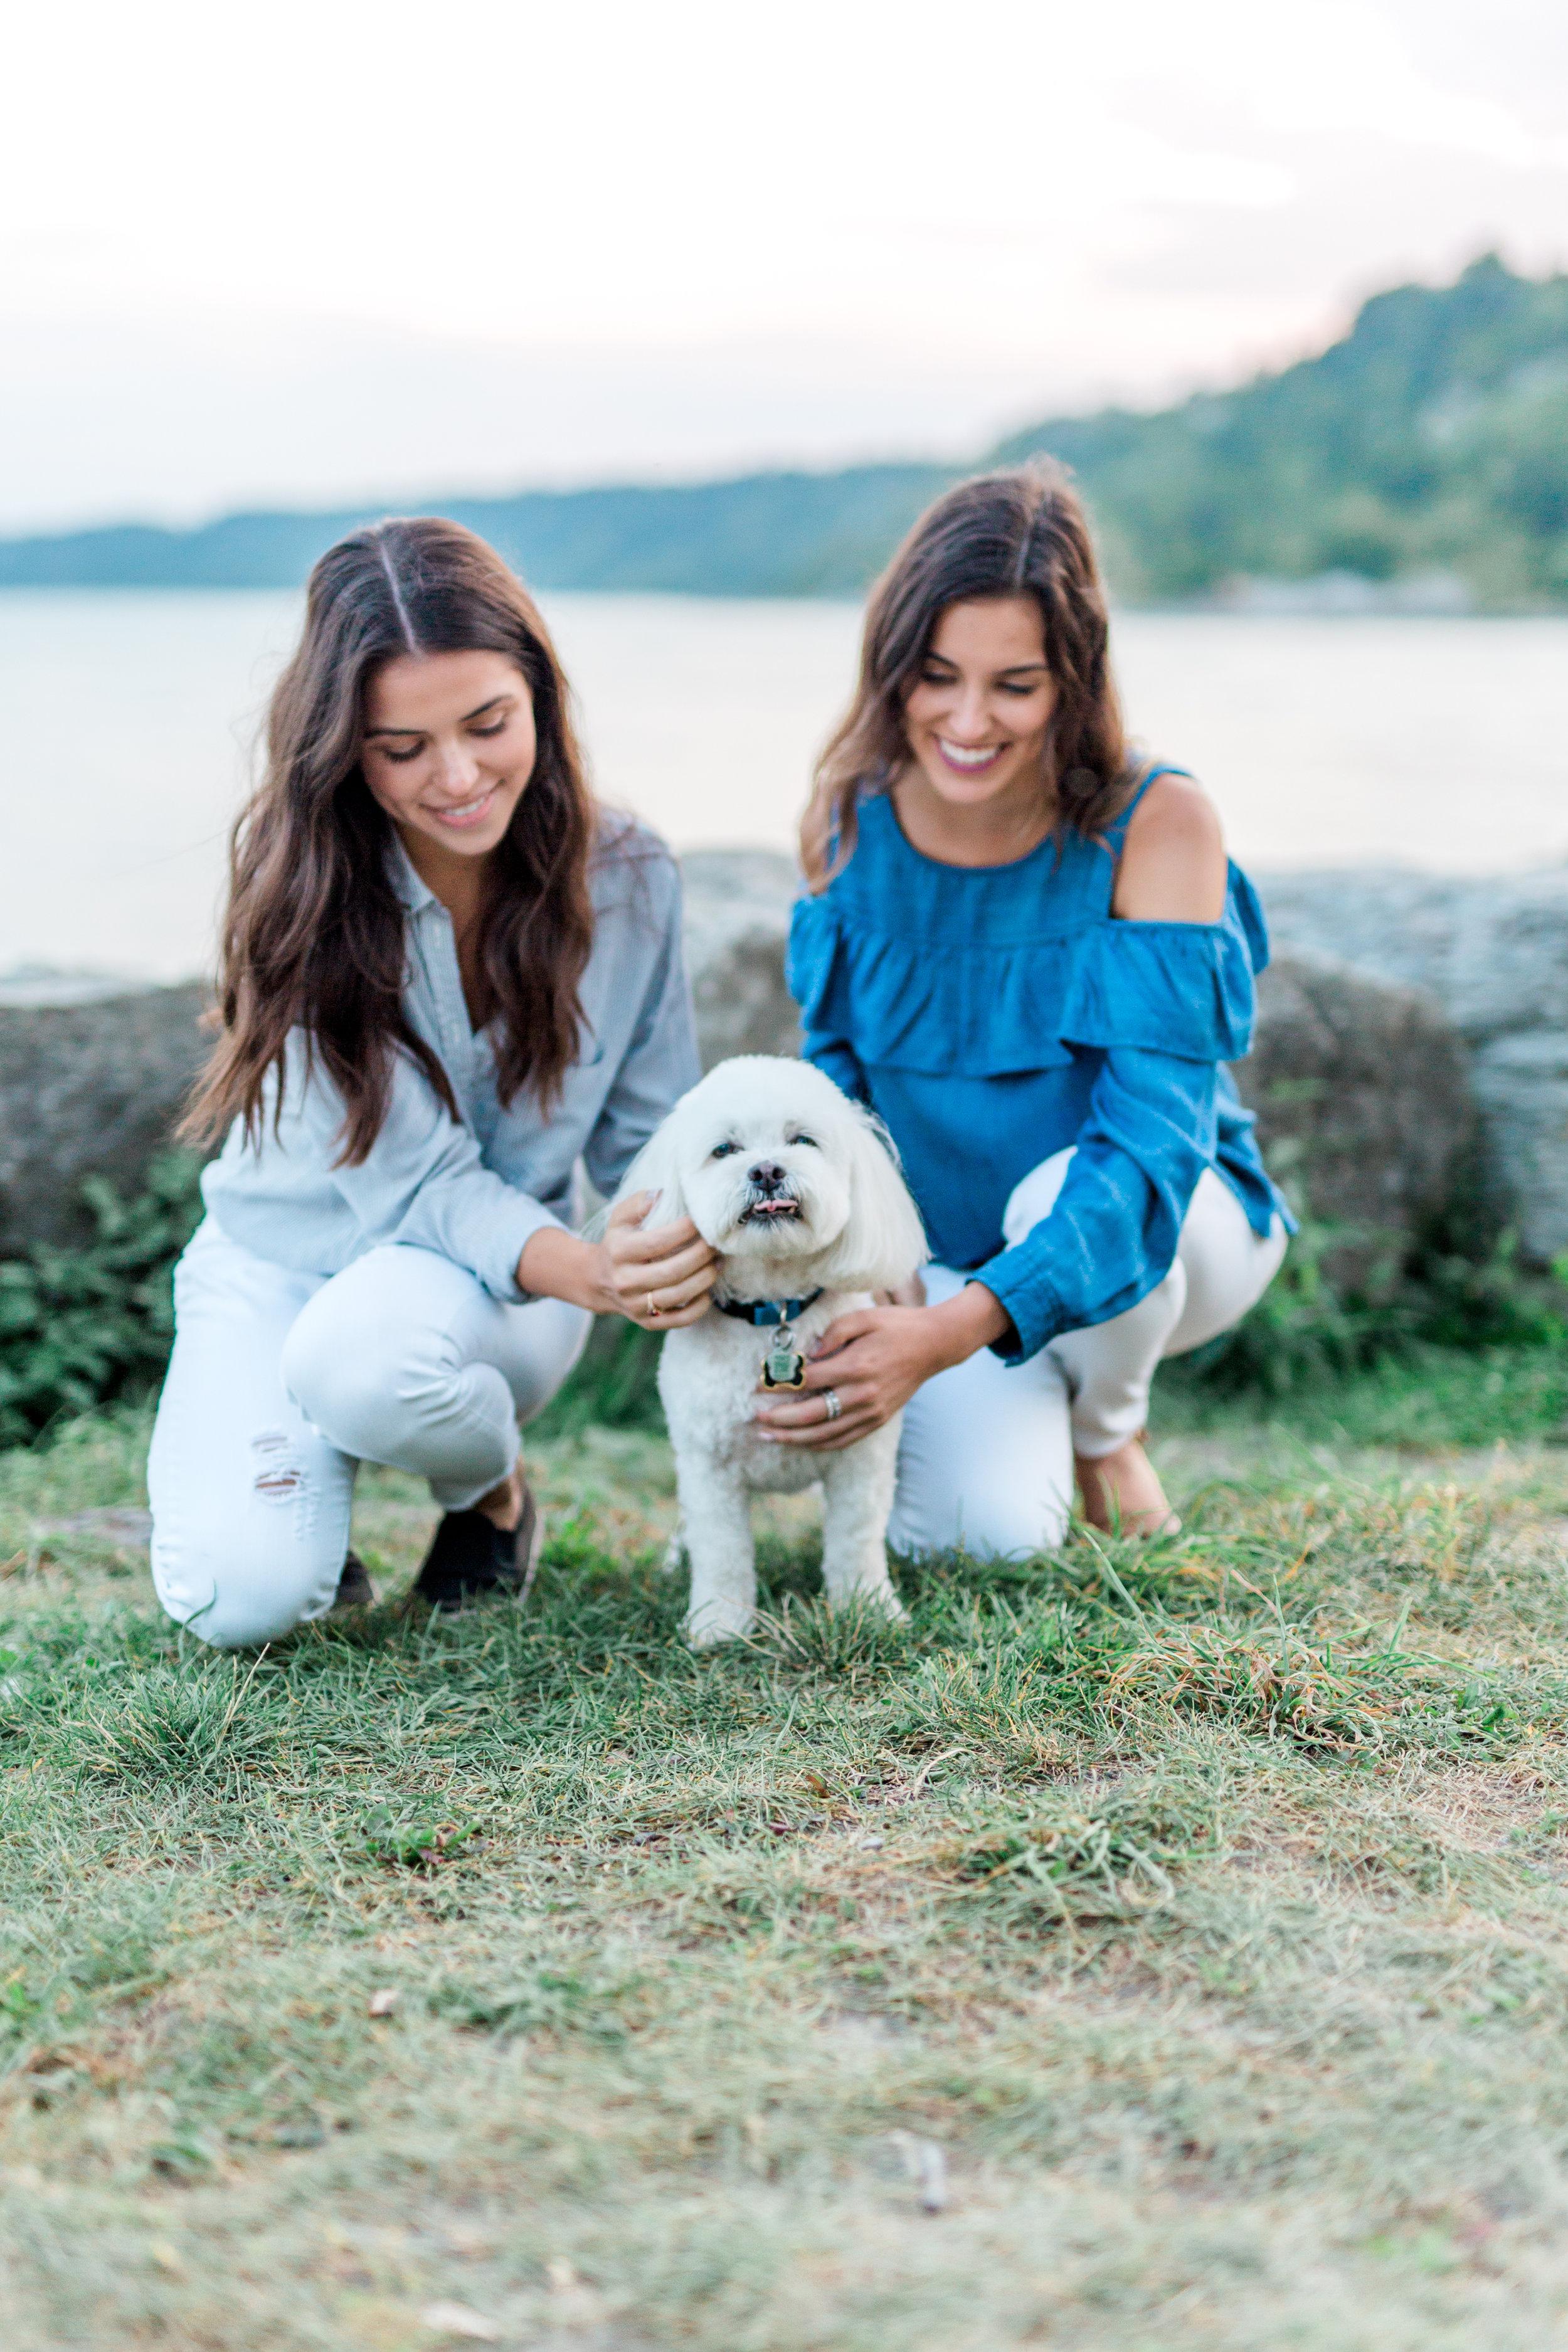 Danielle-Giroux-Amir-Golbazi-Genua-Family-Photography-Scarborough-Bluffs-9937.jpg